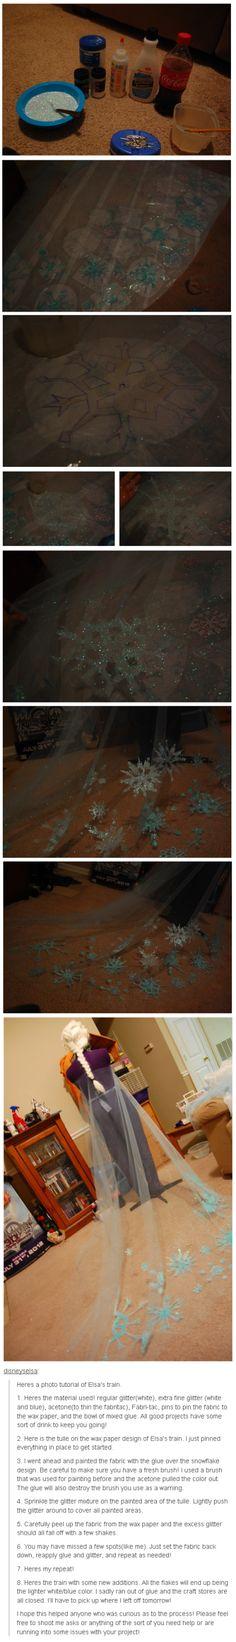 Tutorial for Elsa's train from Frozen!